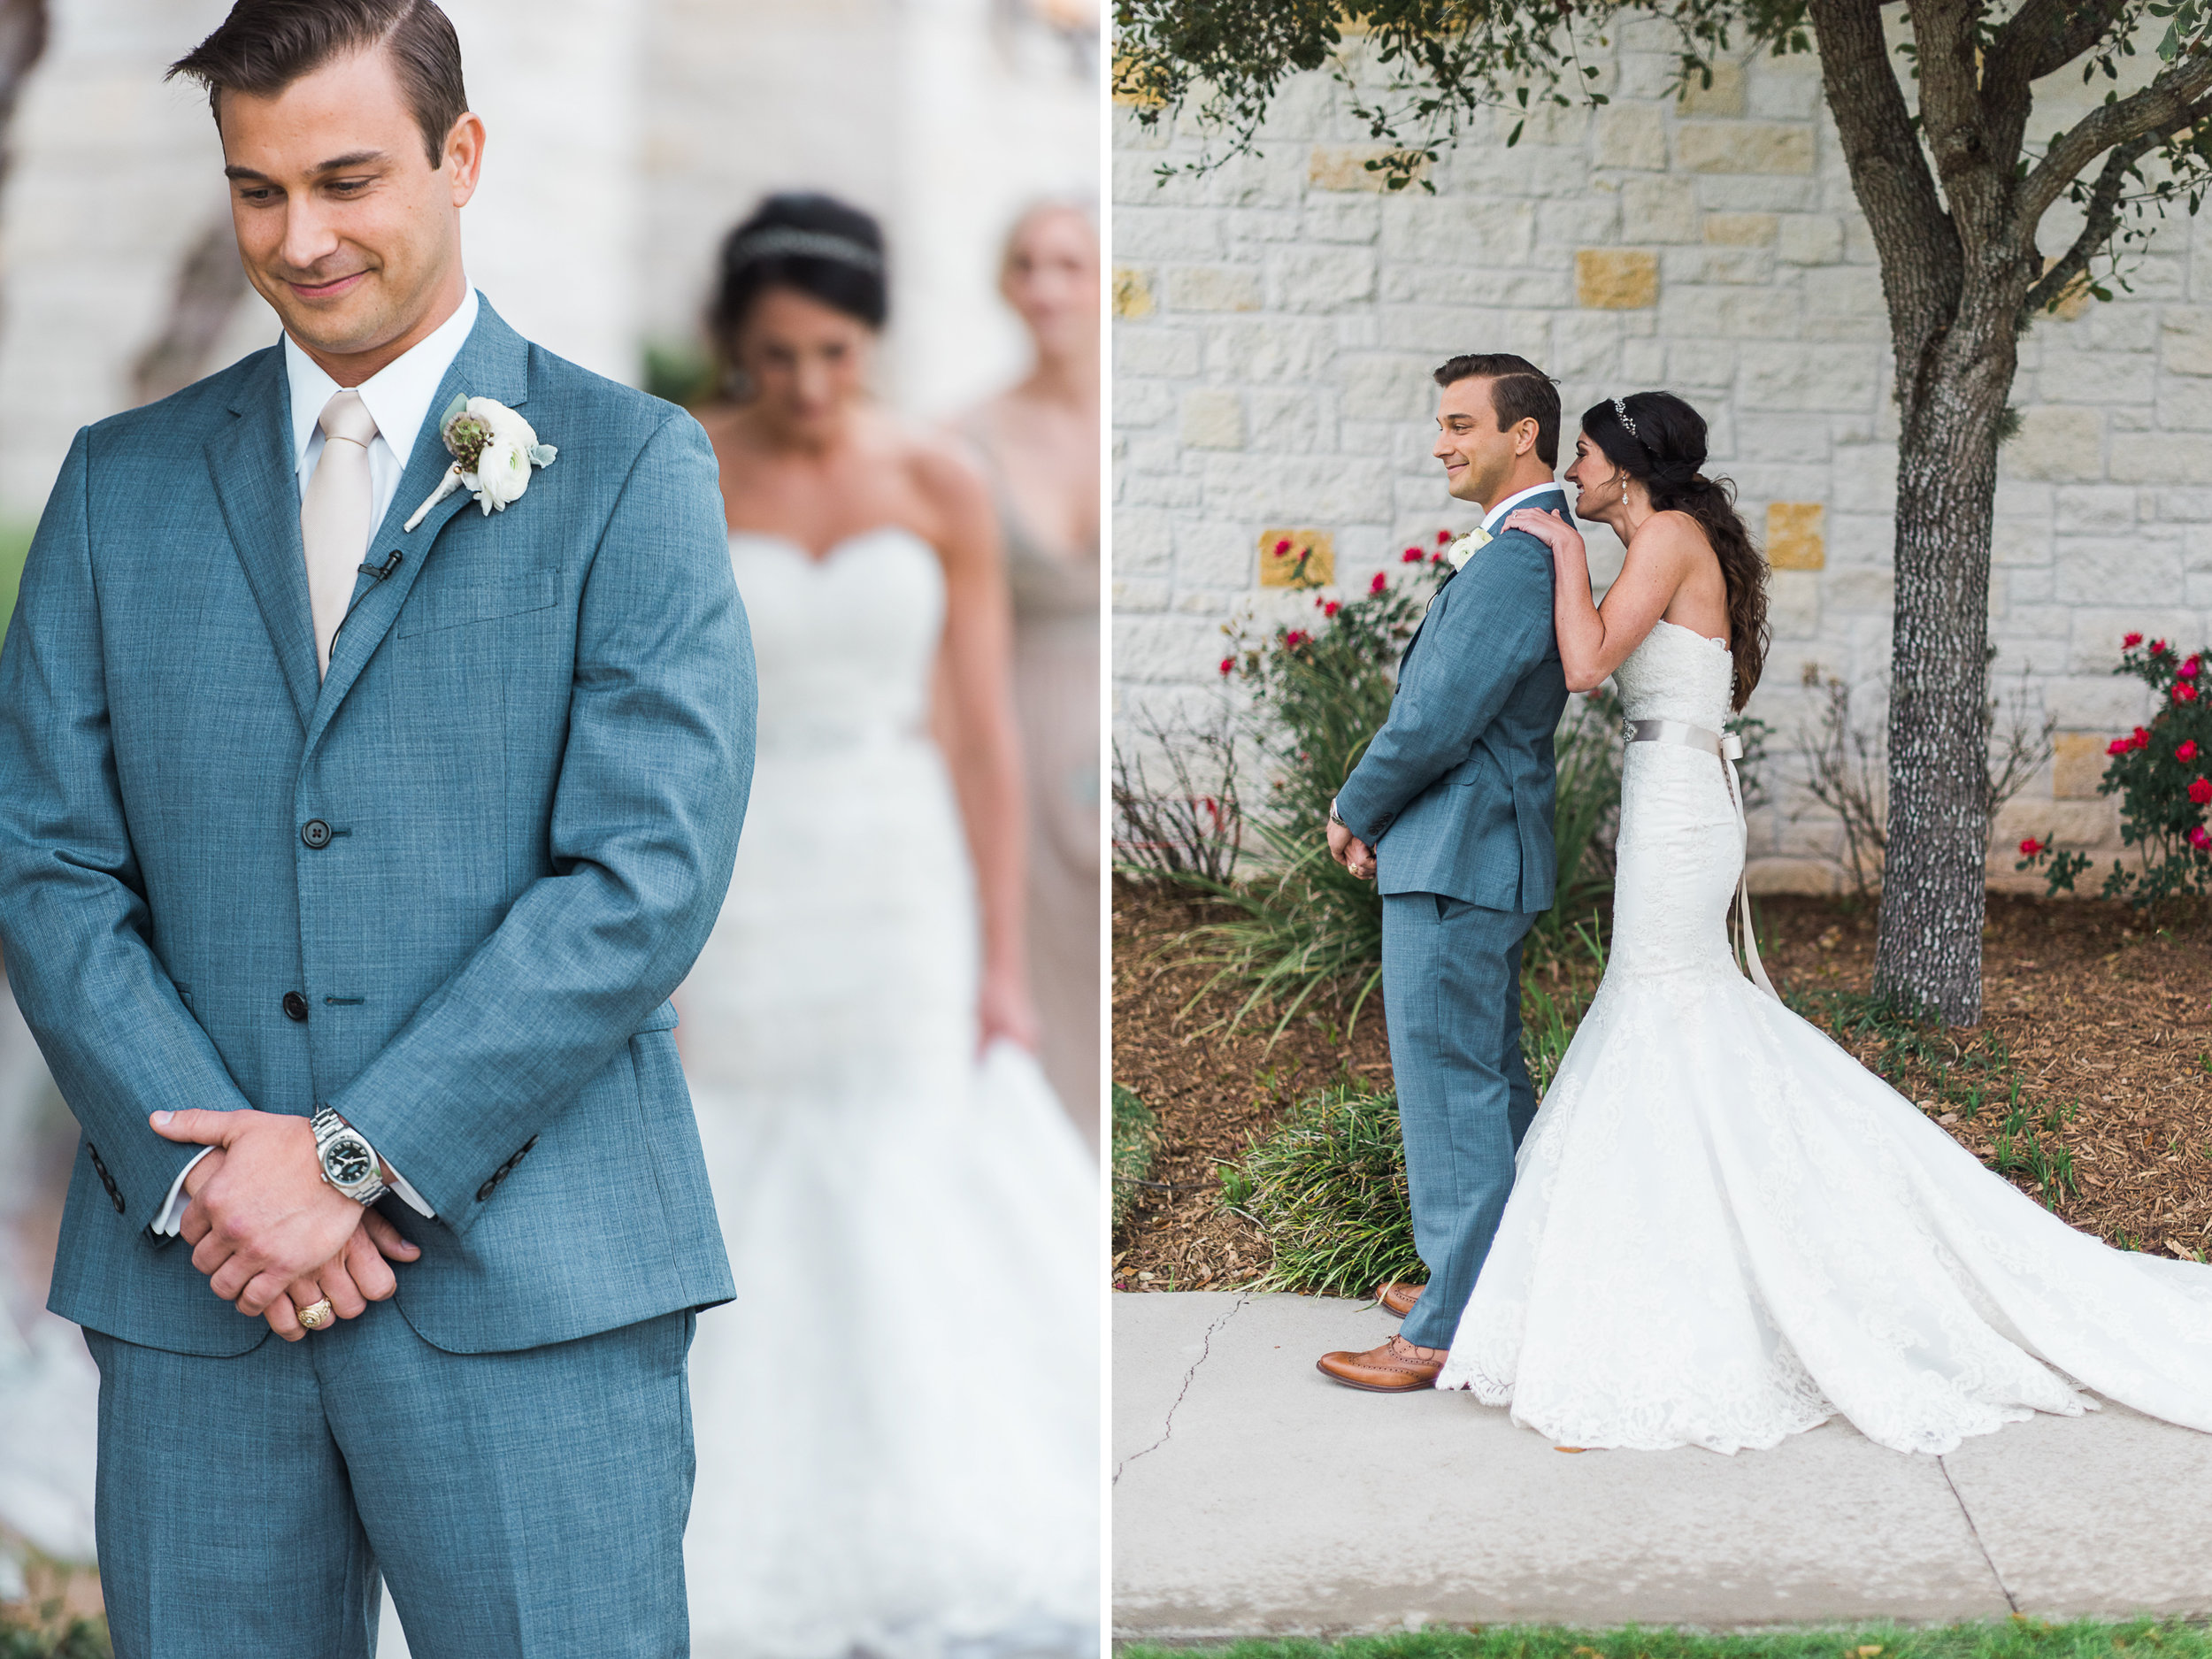 Briscoe-Manor-Houston-Wedding-Photographer-Modern-Luxury-Weddings-Dana-Fernandez-Photograpy-Fine-Art-Photographer-Houston-Film-Destination-PNW-Wedding-Photographer-118.jpg